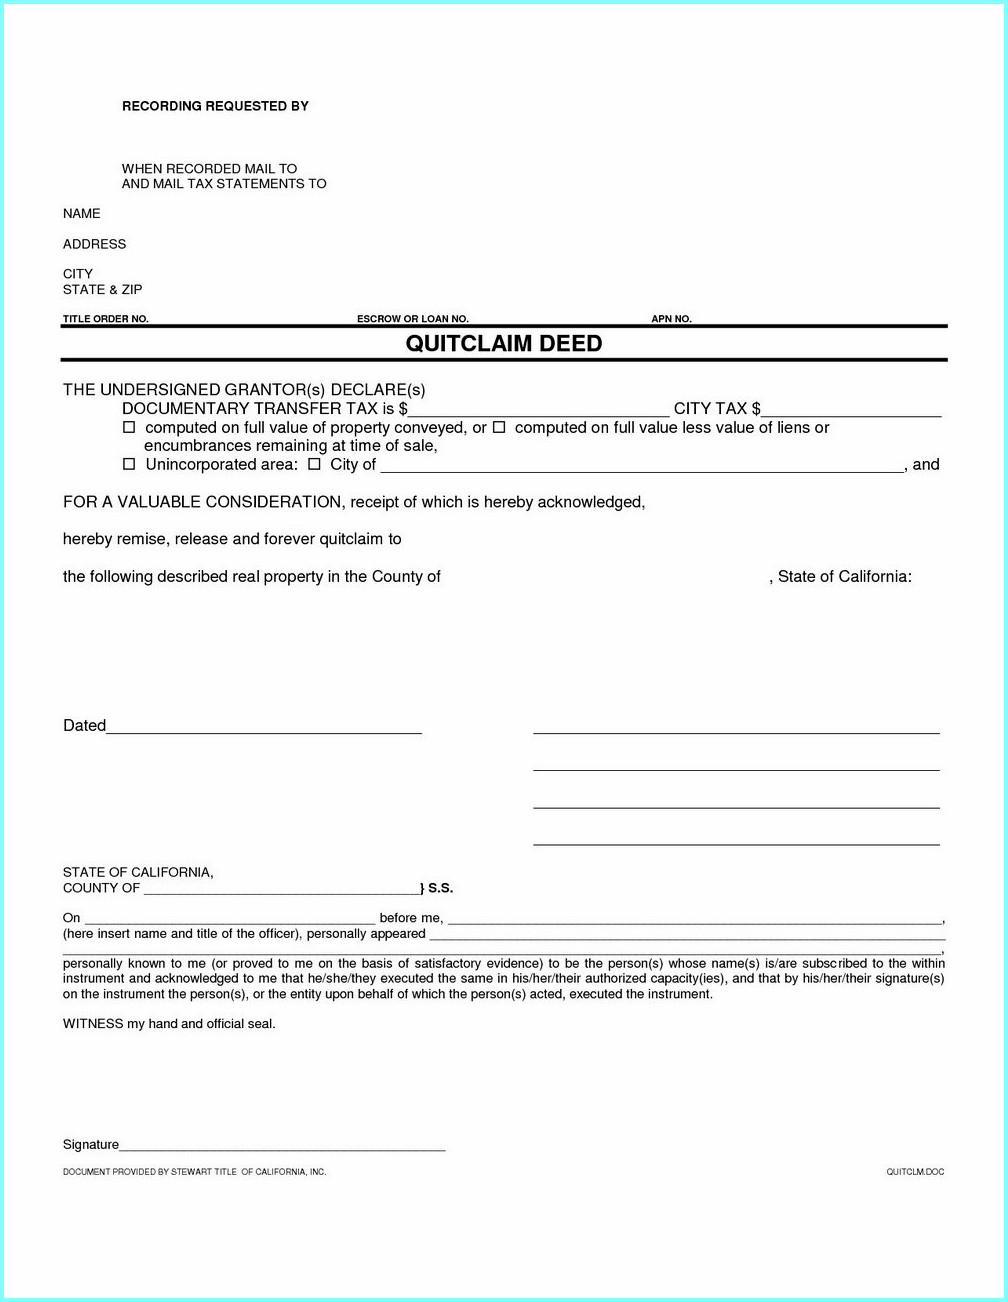 Quit Claim Deed Form California Orange County